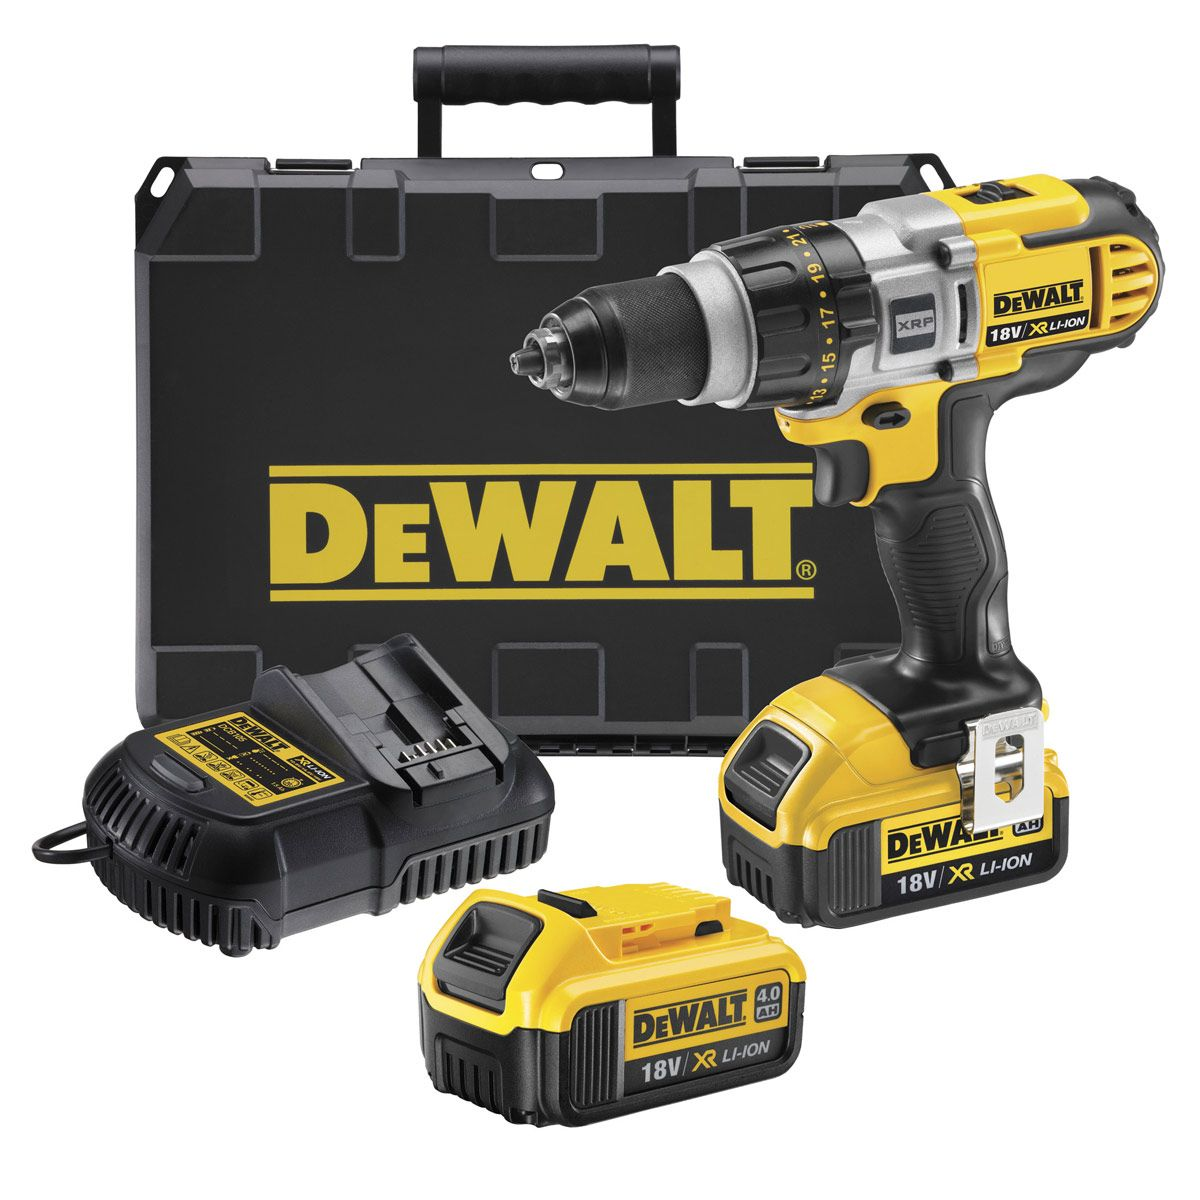 DeWalt Drill Driver Kit DCD980M2 18V EAN 5035048390702